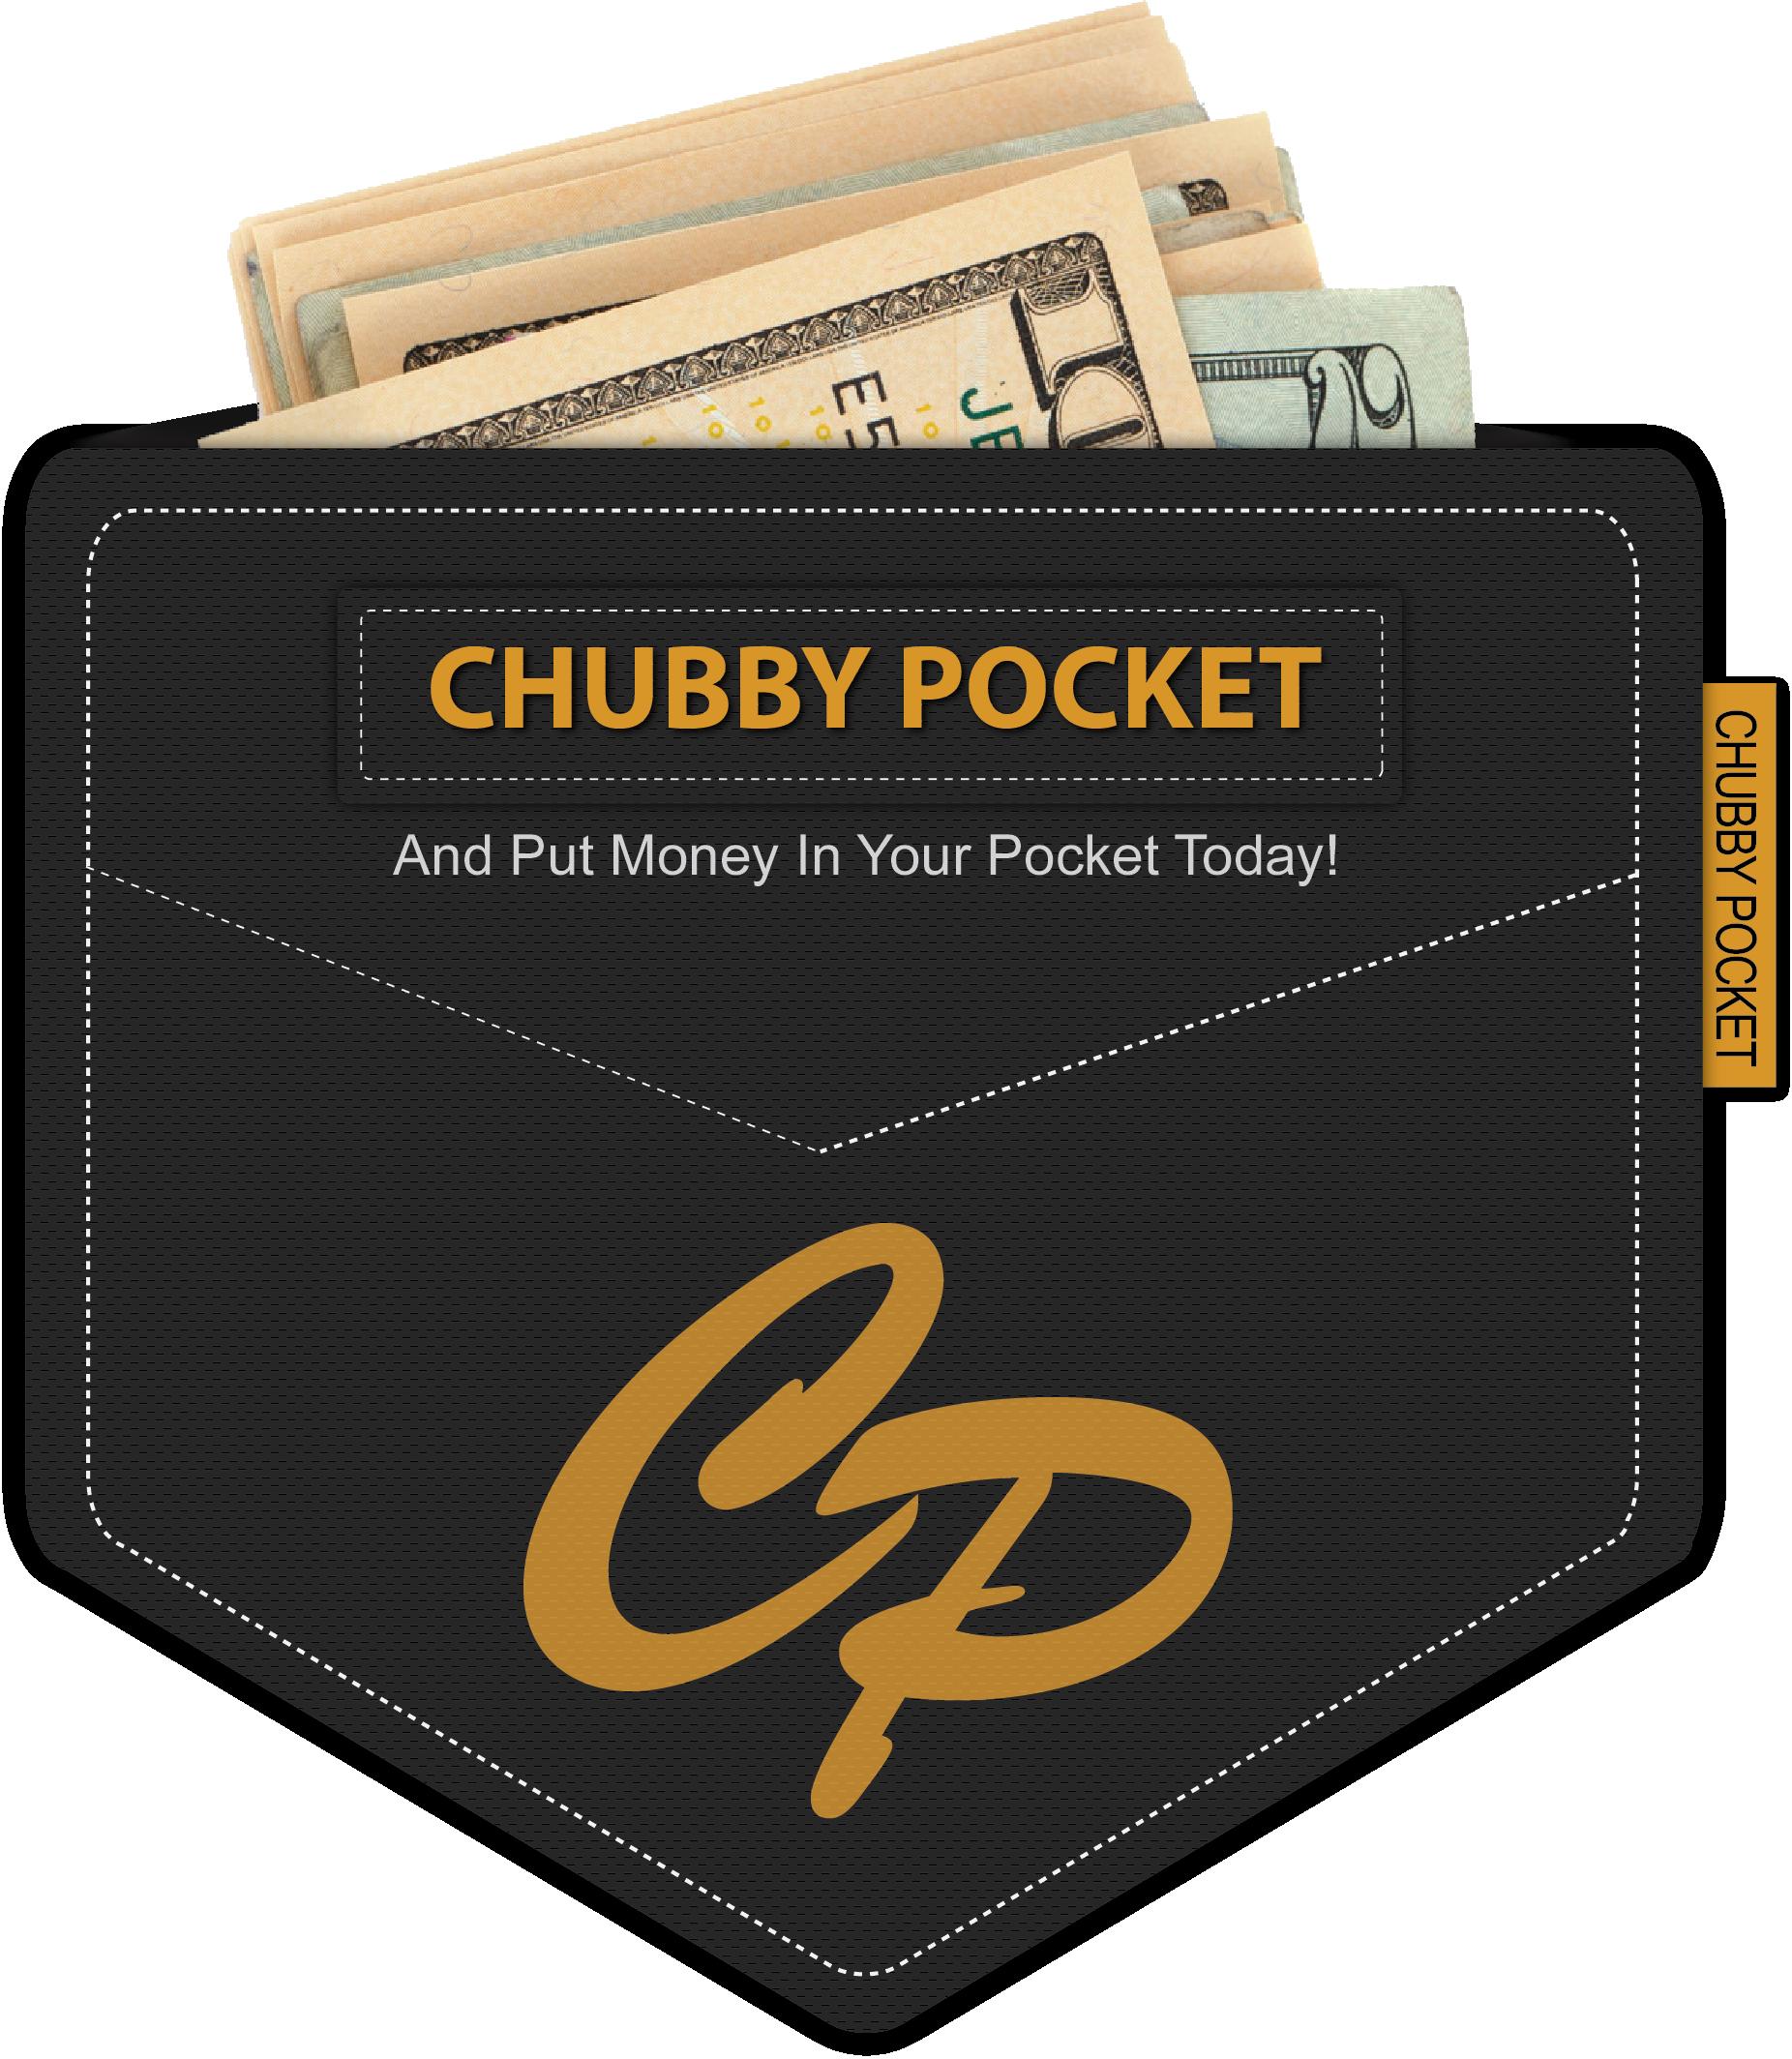 Chubby Pocket